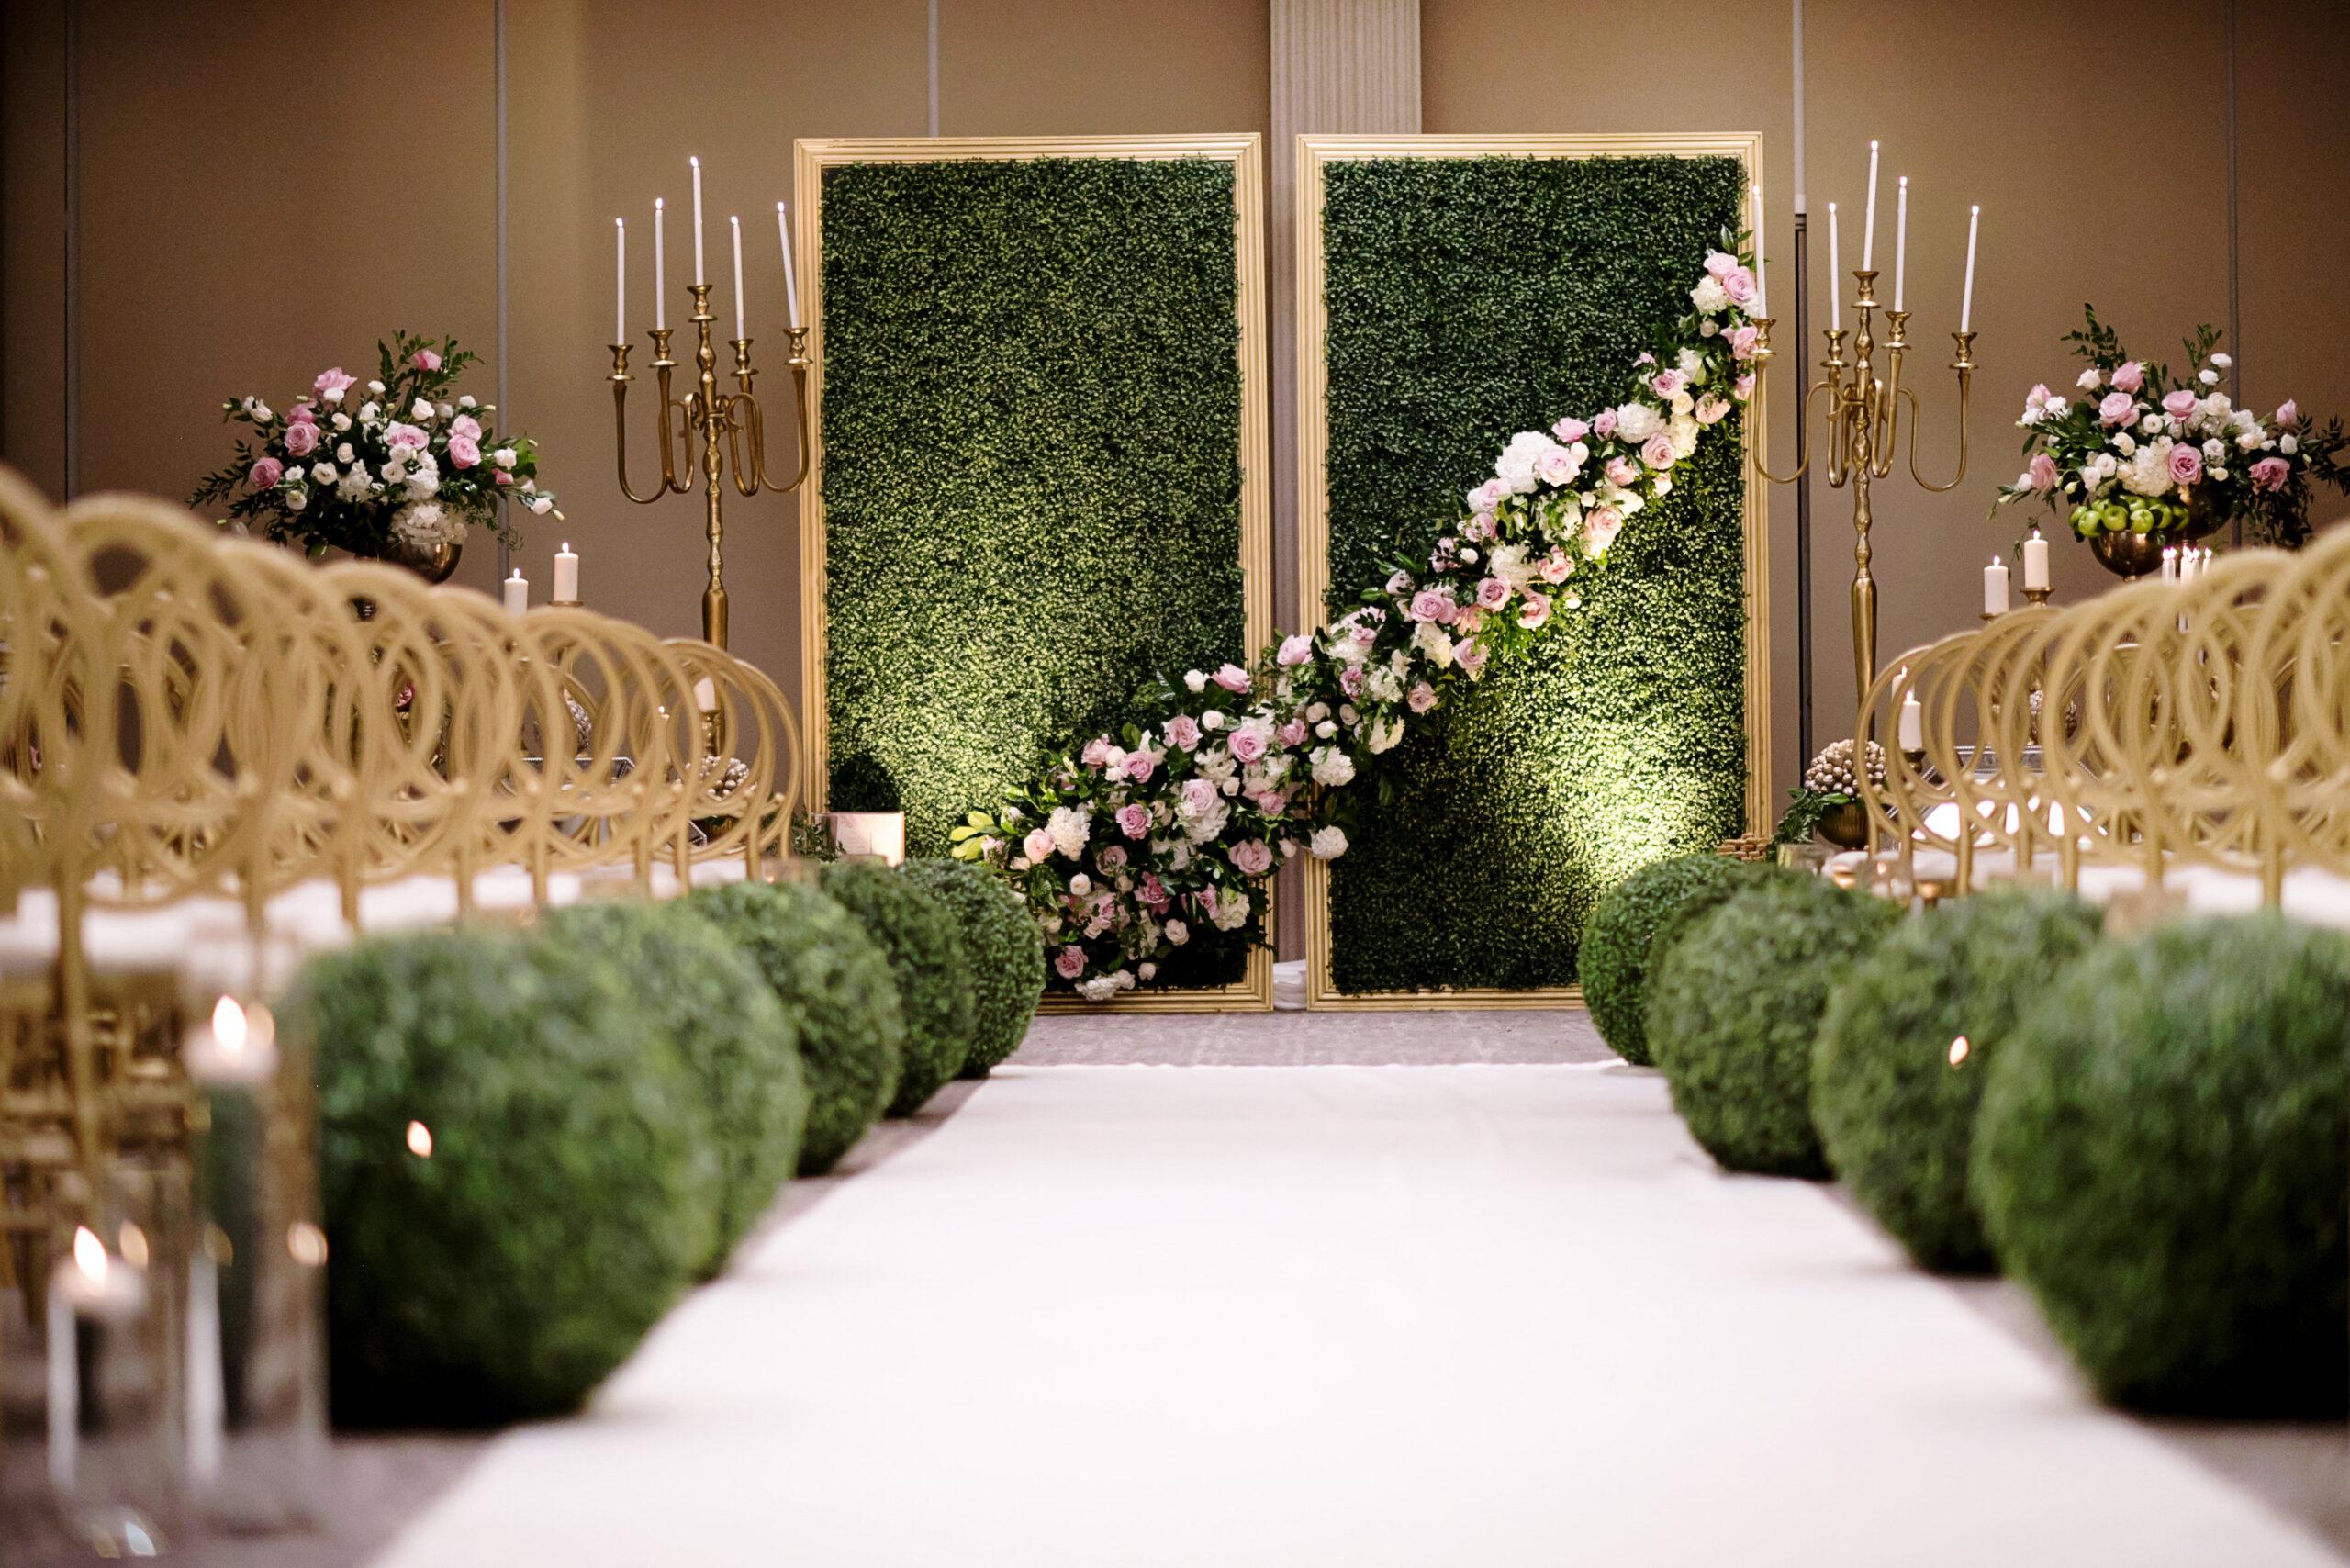 https://secureservercdn.net/45.40.145.151/kgq.ab5.myftpupload.com/wp-content/uploads/2020/04/Sanam-Soroush-s-Wedding-wedluxe-submission-0036-scaled.jpg?time=1620980216